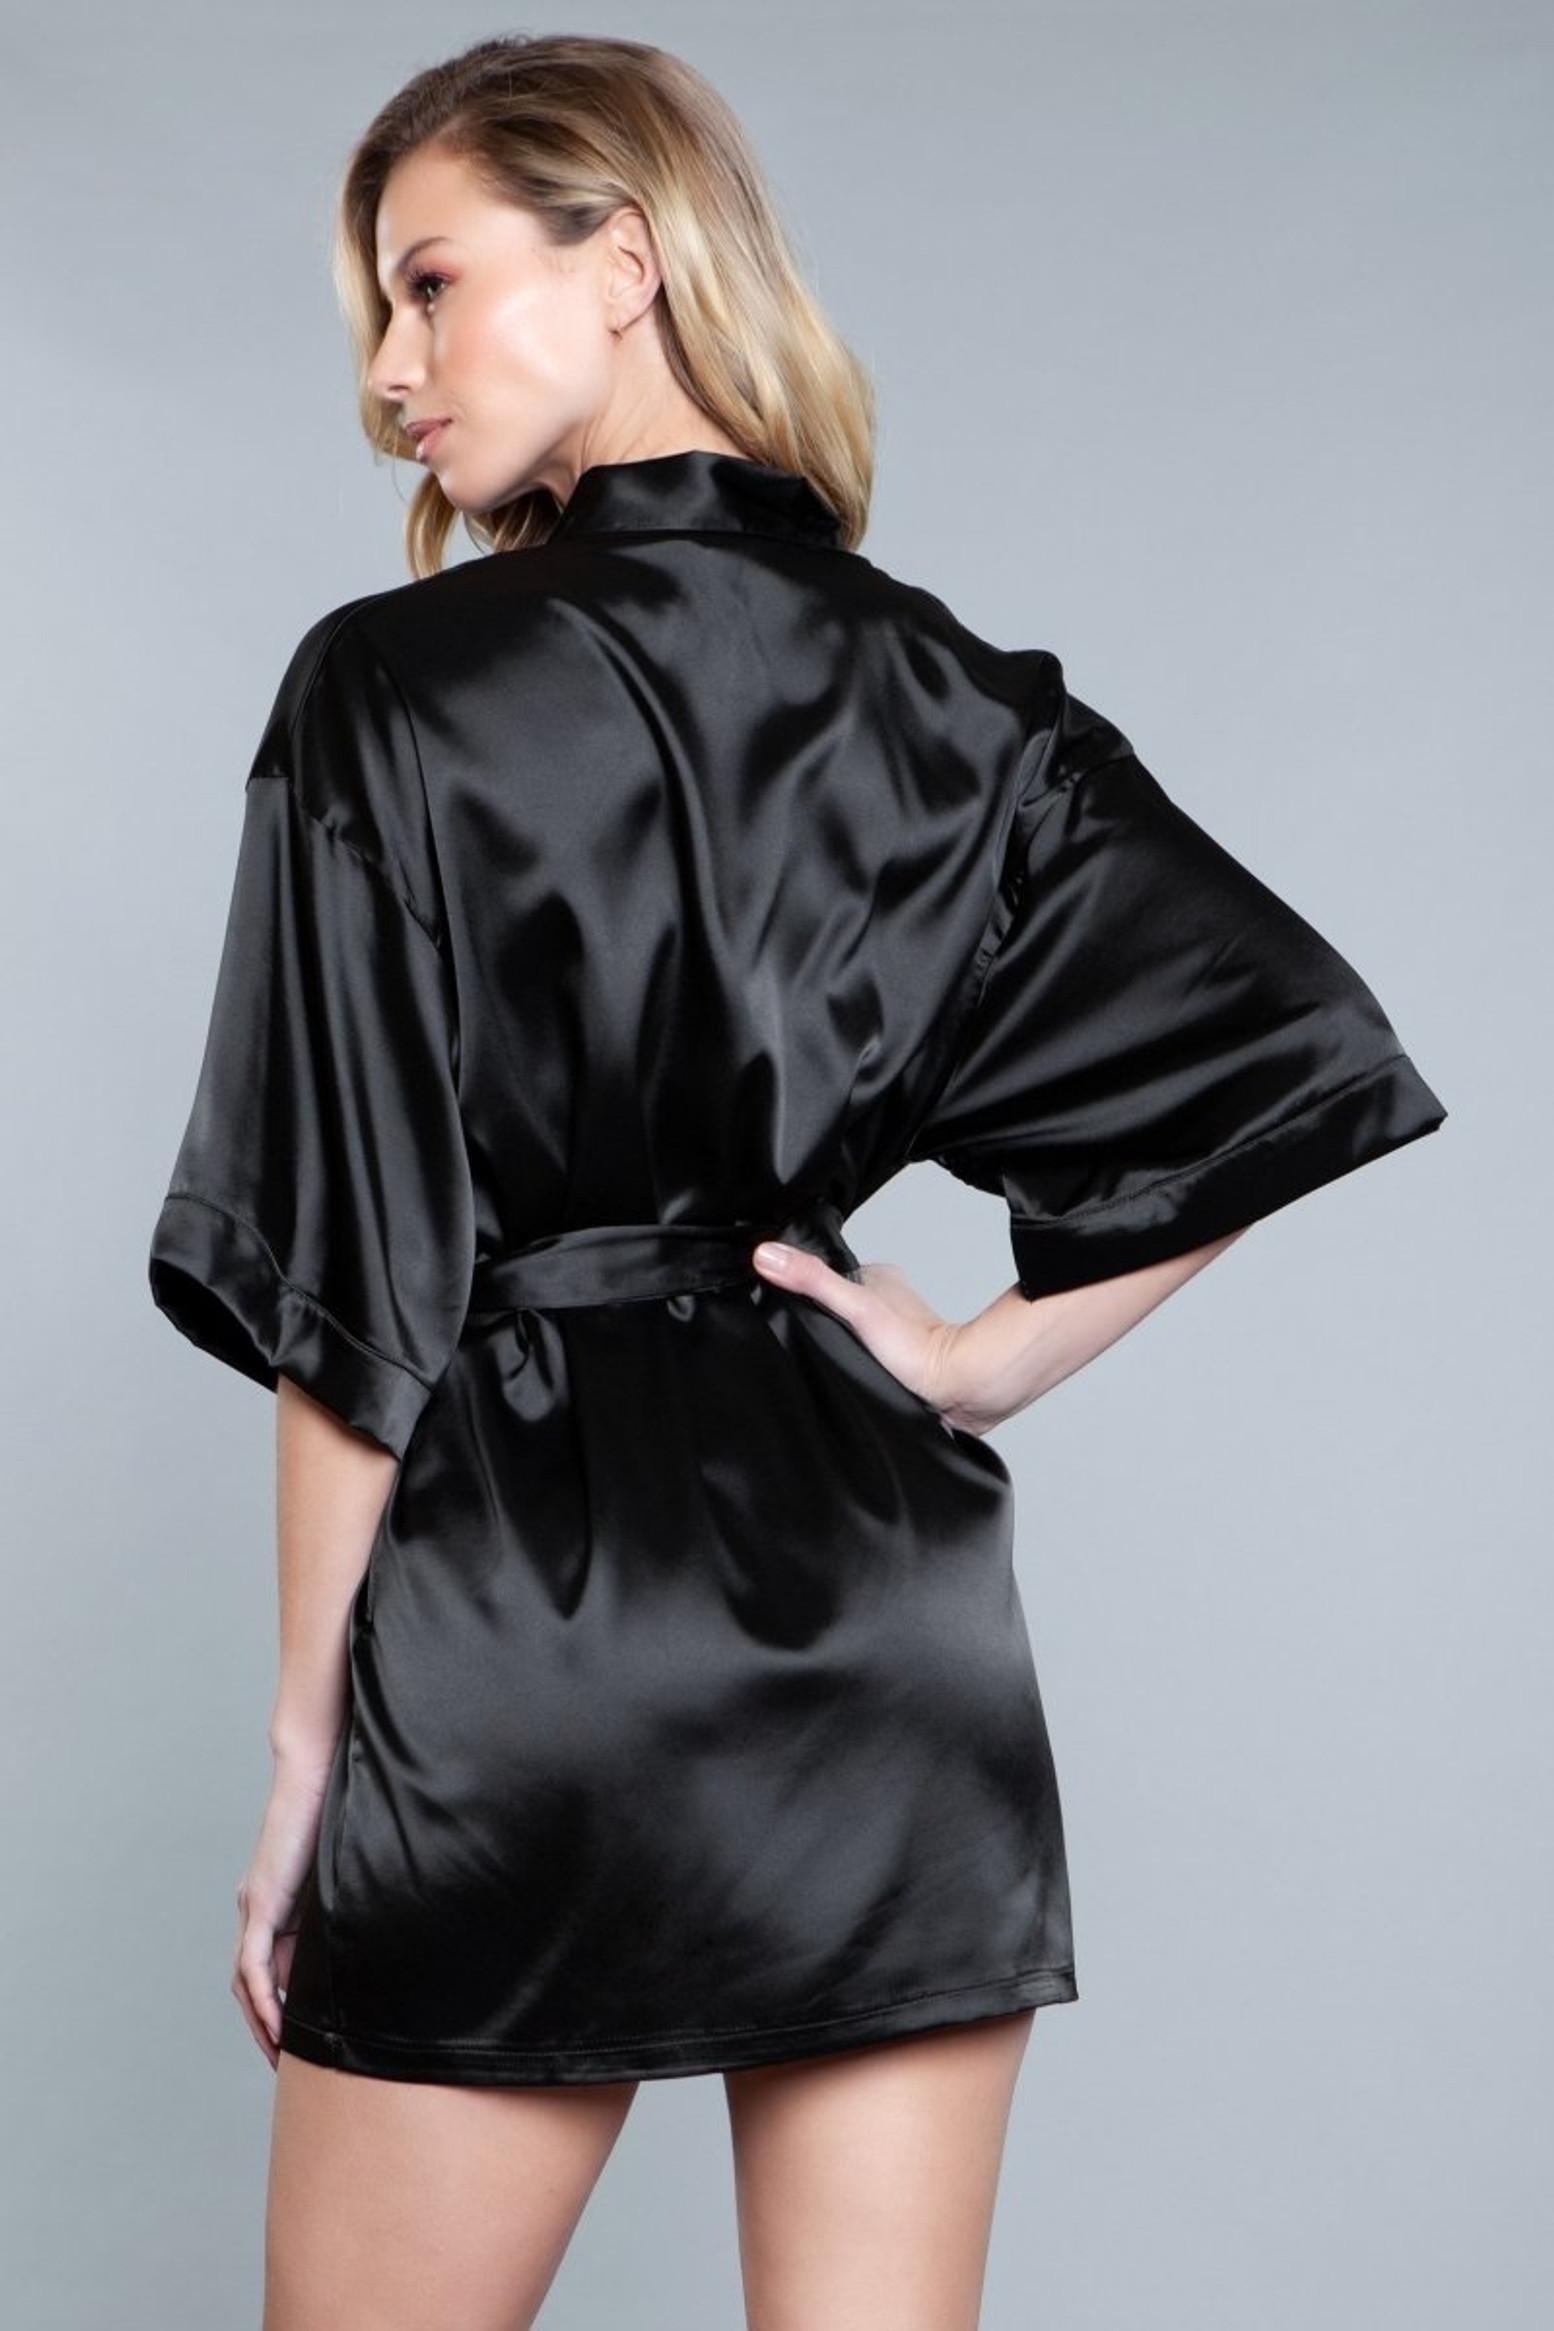 1947 Home Alone Robe - Black